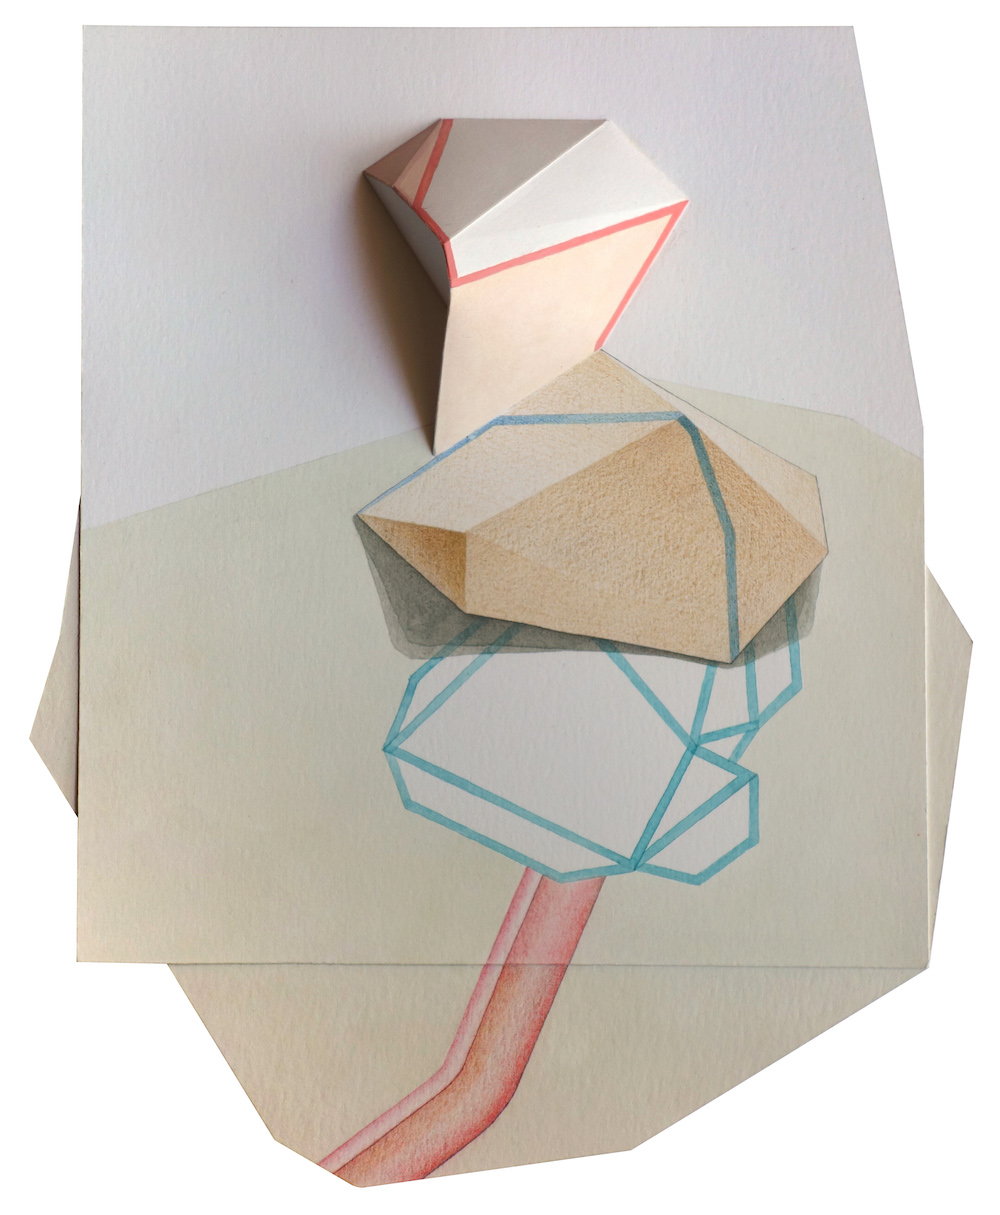 S/T (Serie Leyes de Maclas) | Gouache, acuarela, grafito y lápices de color sobre papel | 27,5 x 22,5 x 4 cm | 2016